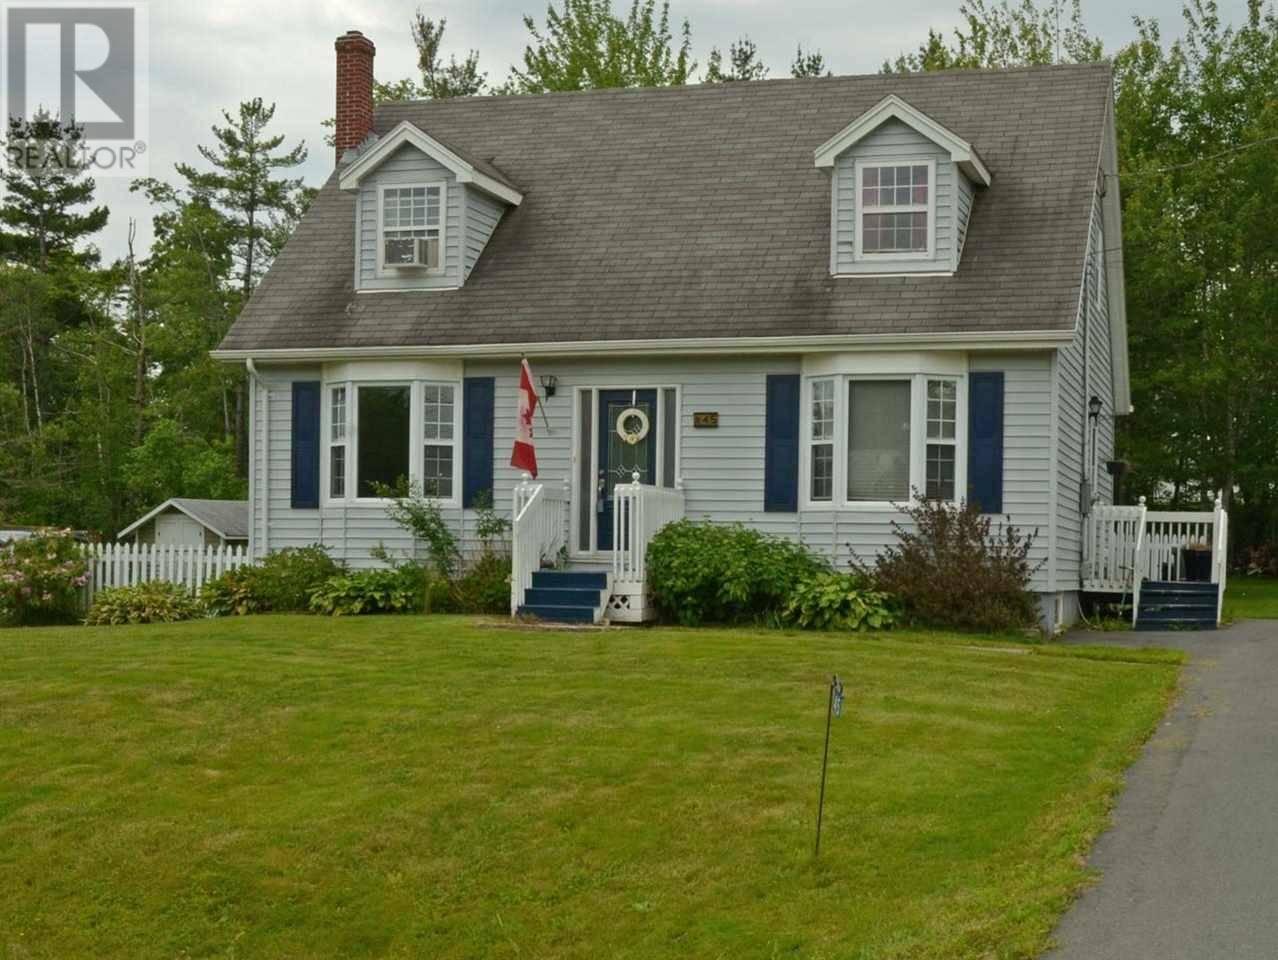 House for sale at 45 Shamrock Ln Enfield Nova Scotia - MLS: 201816233